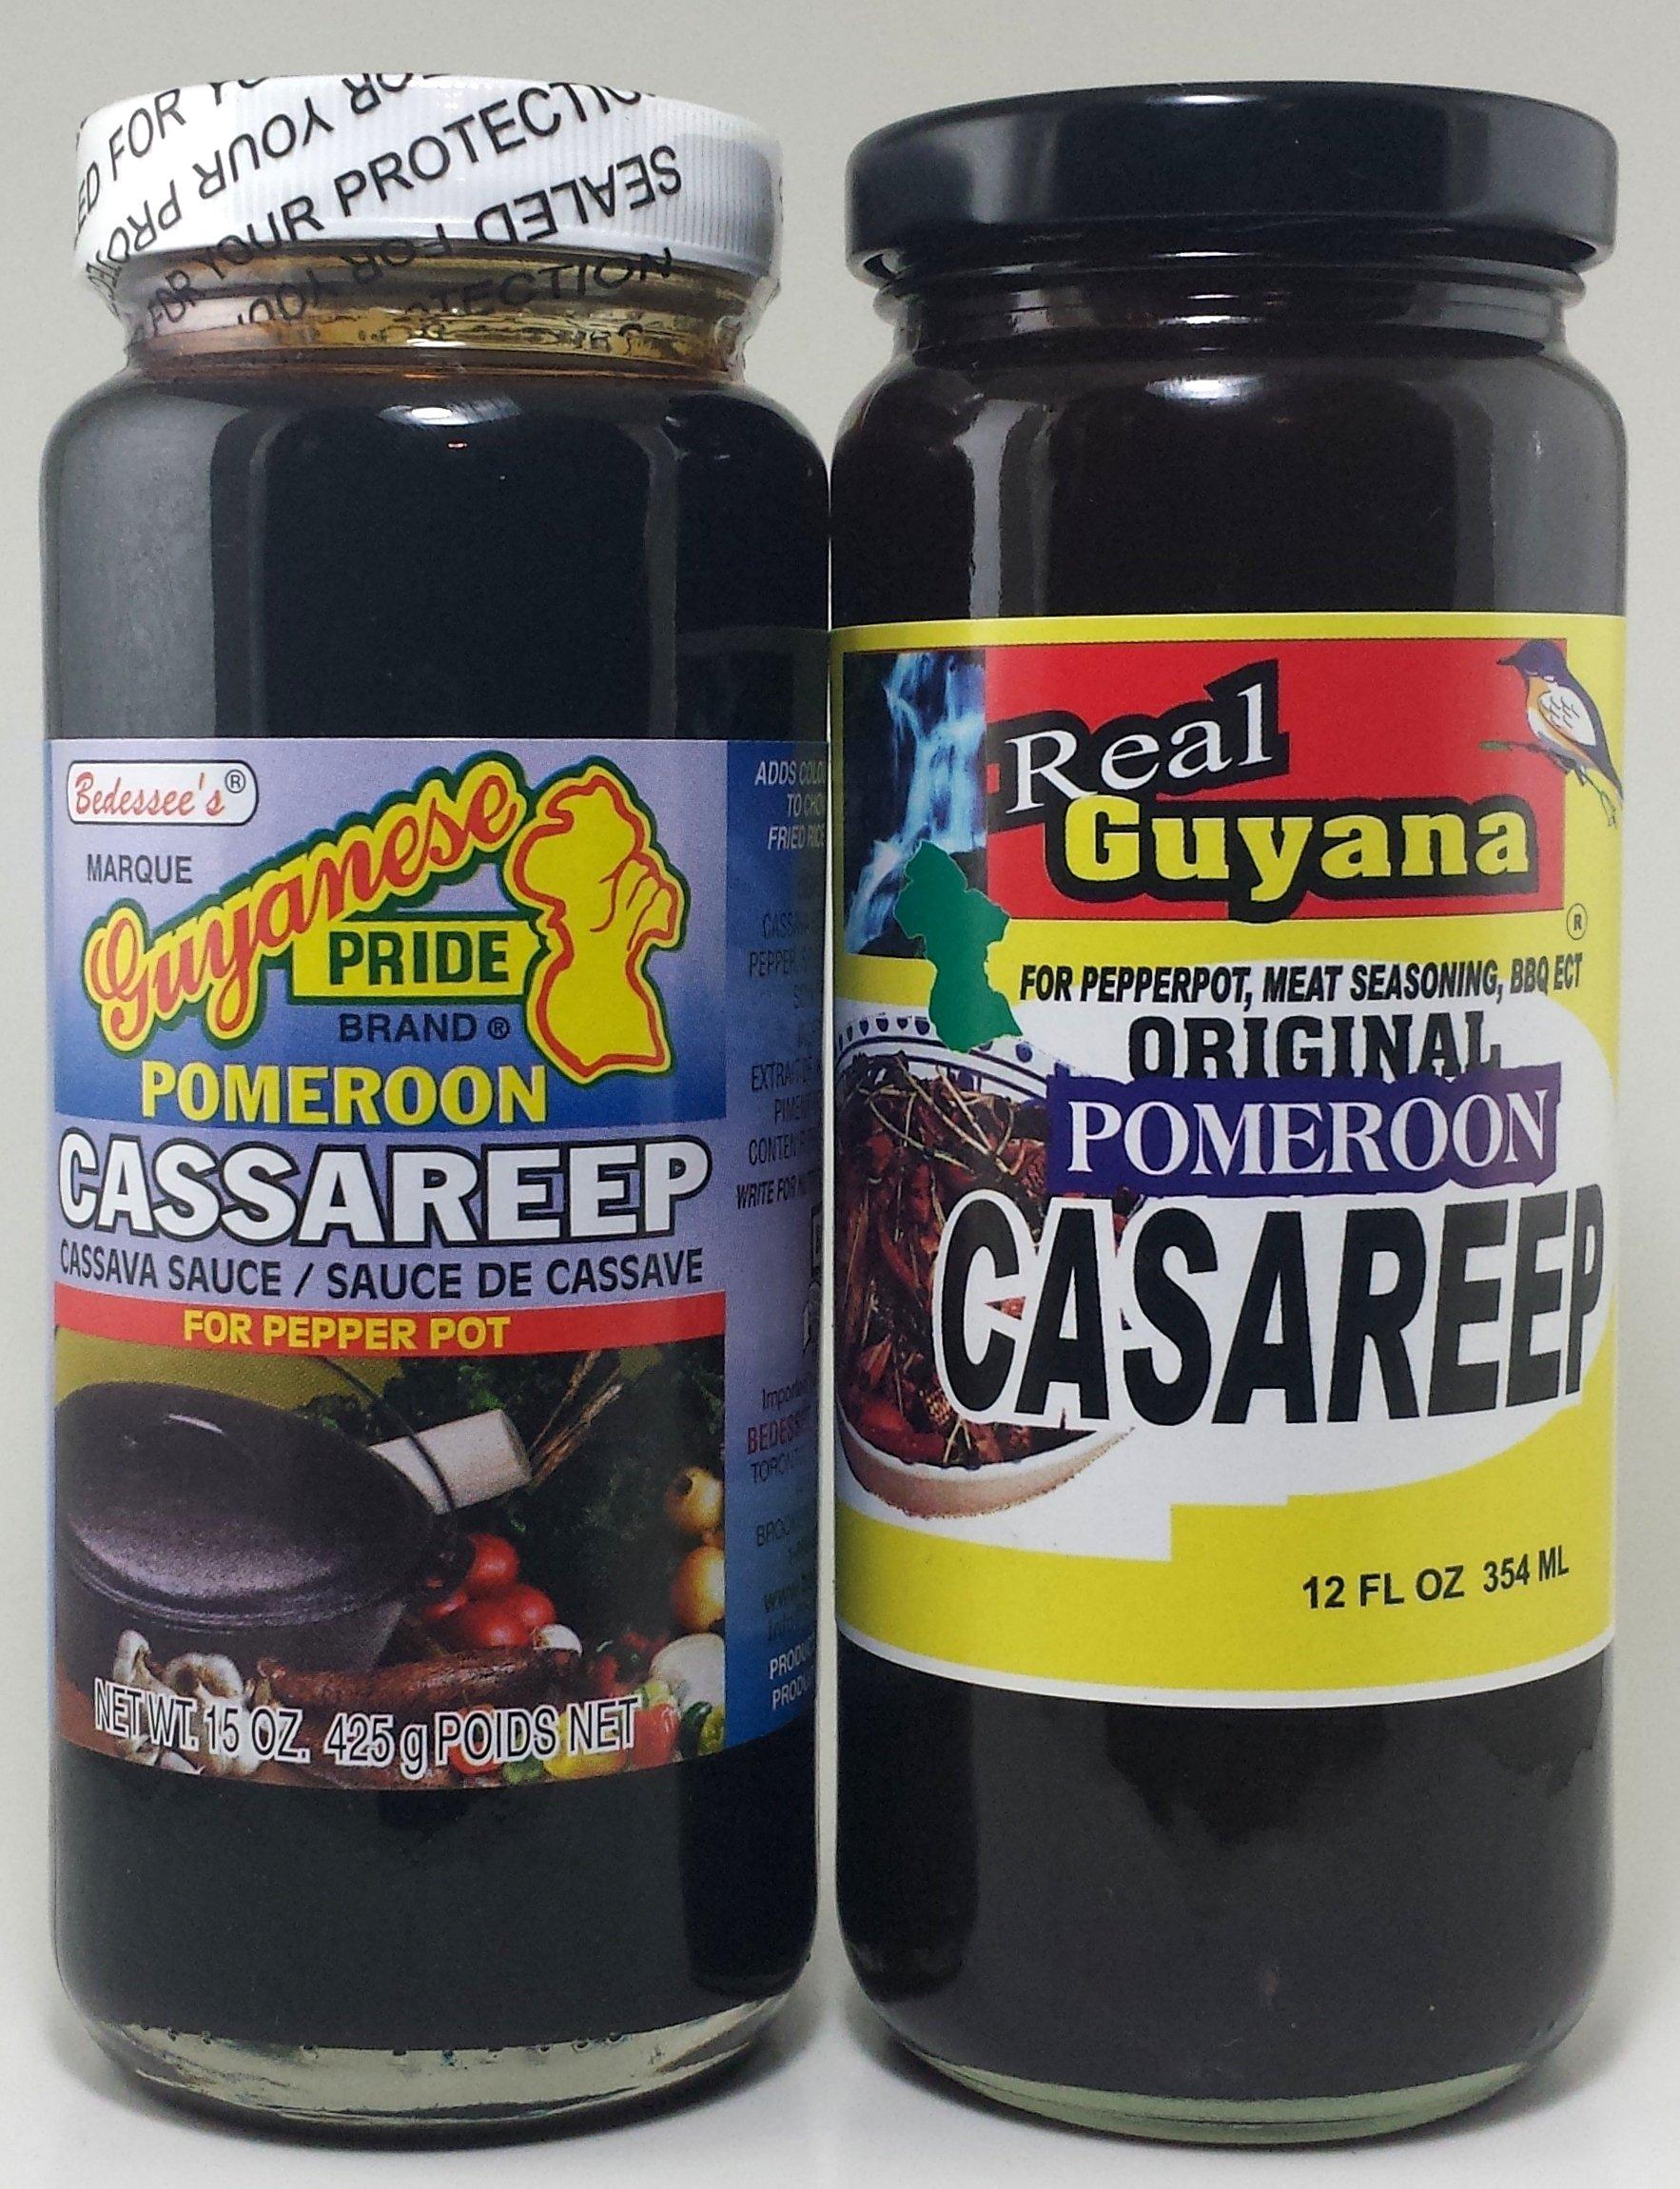 Casareep - Real Guyana (12oz) & Guyanese Pride (15.oz)